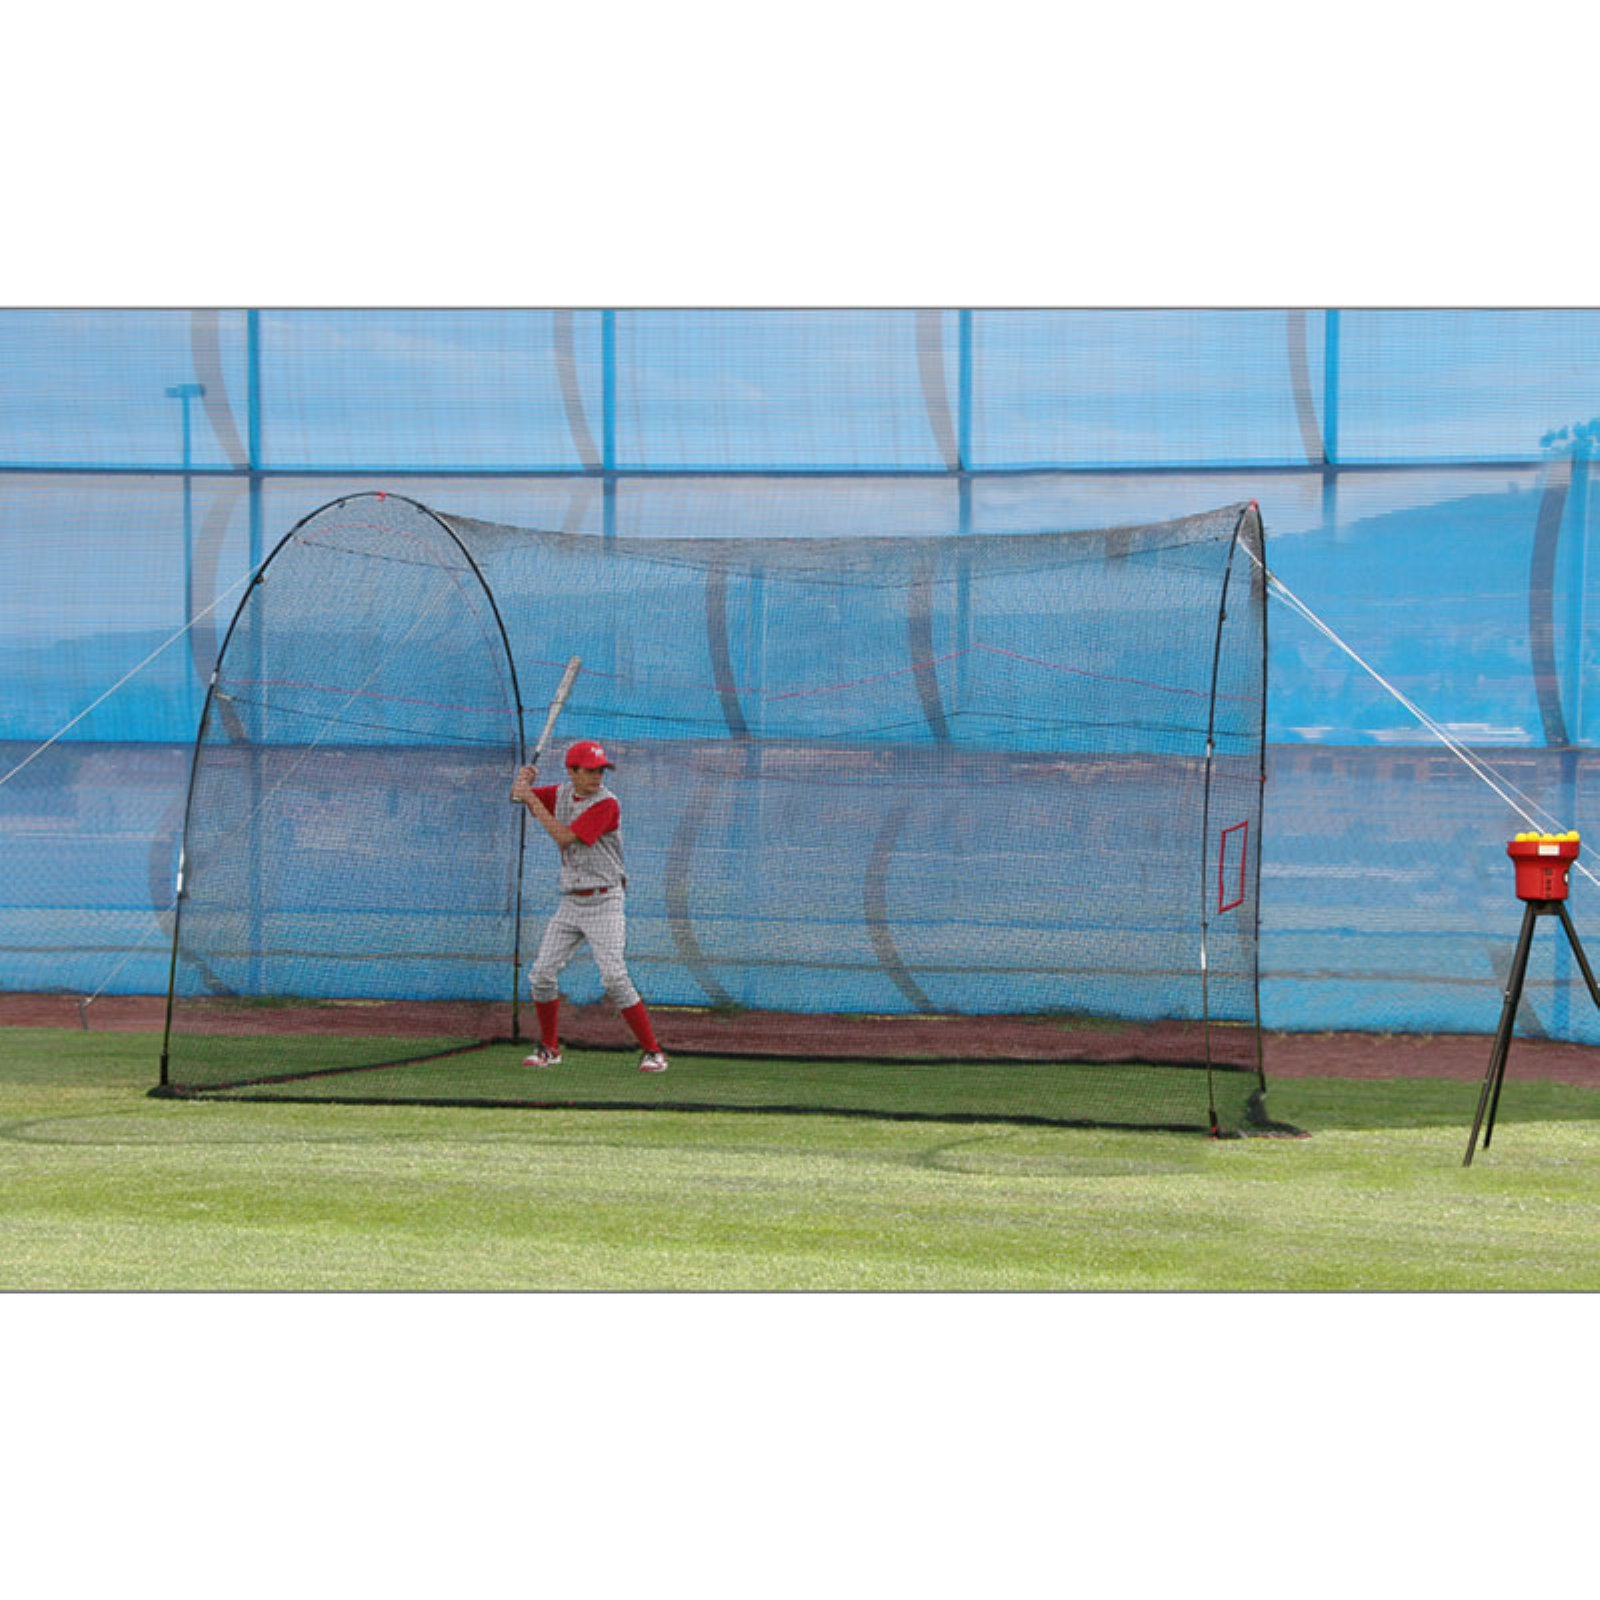 Trend Sports CR199 Heater HomeRun Batting Cage